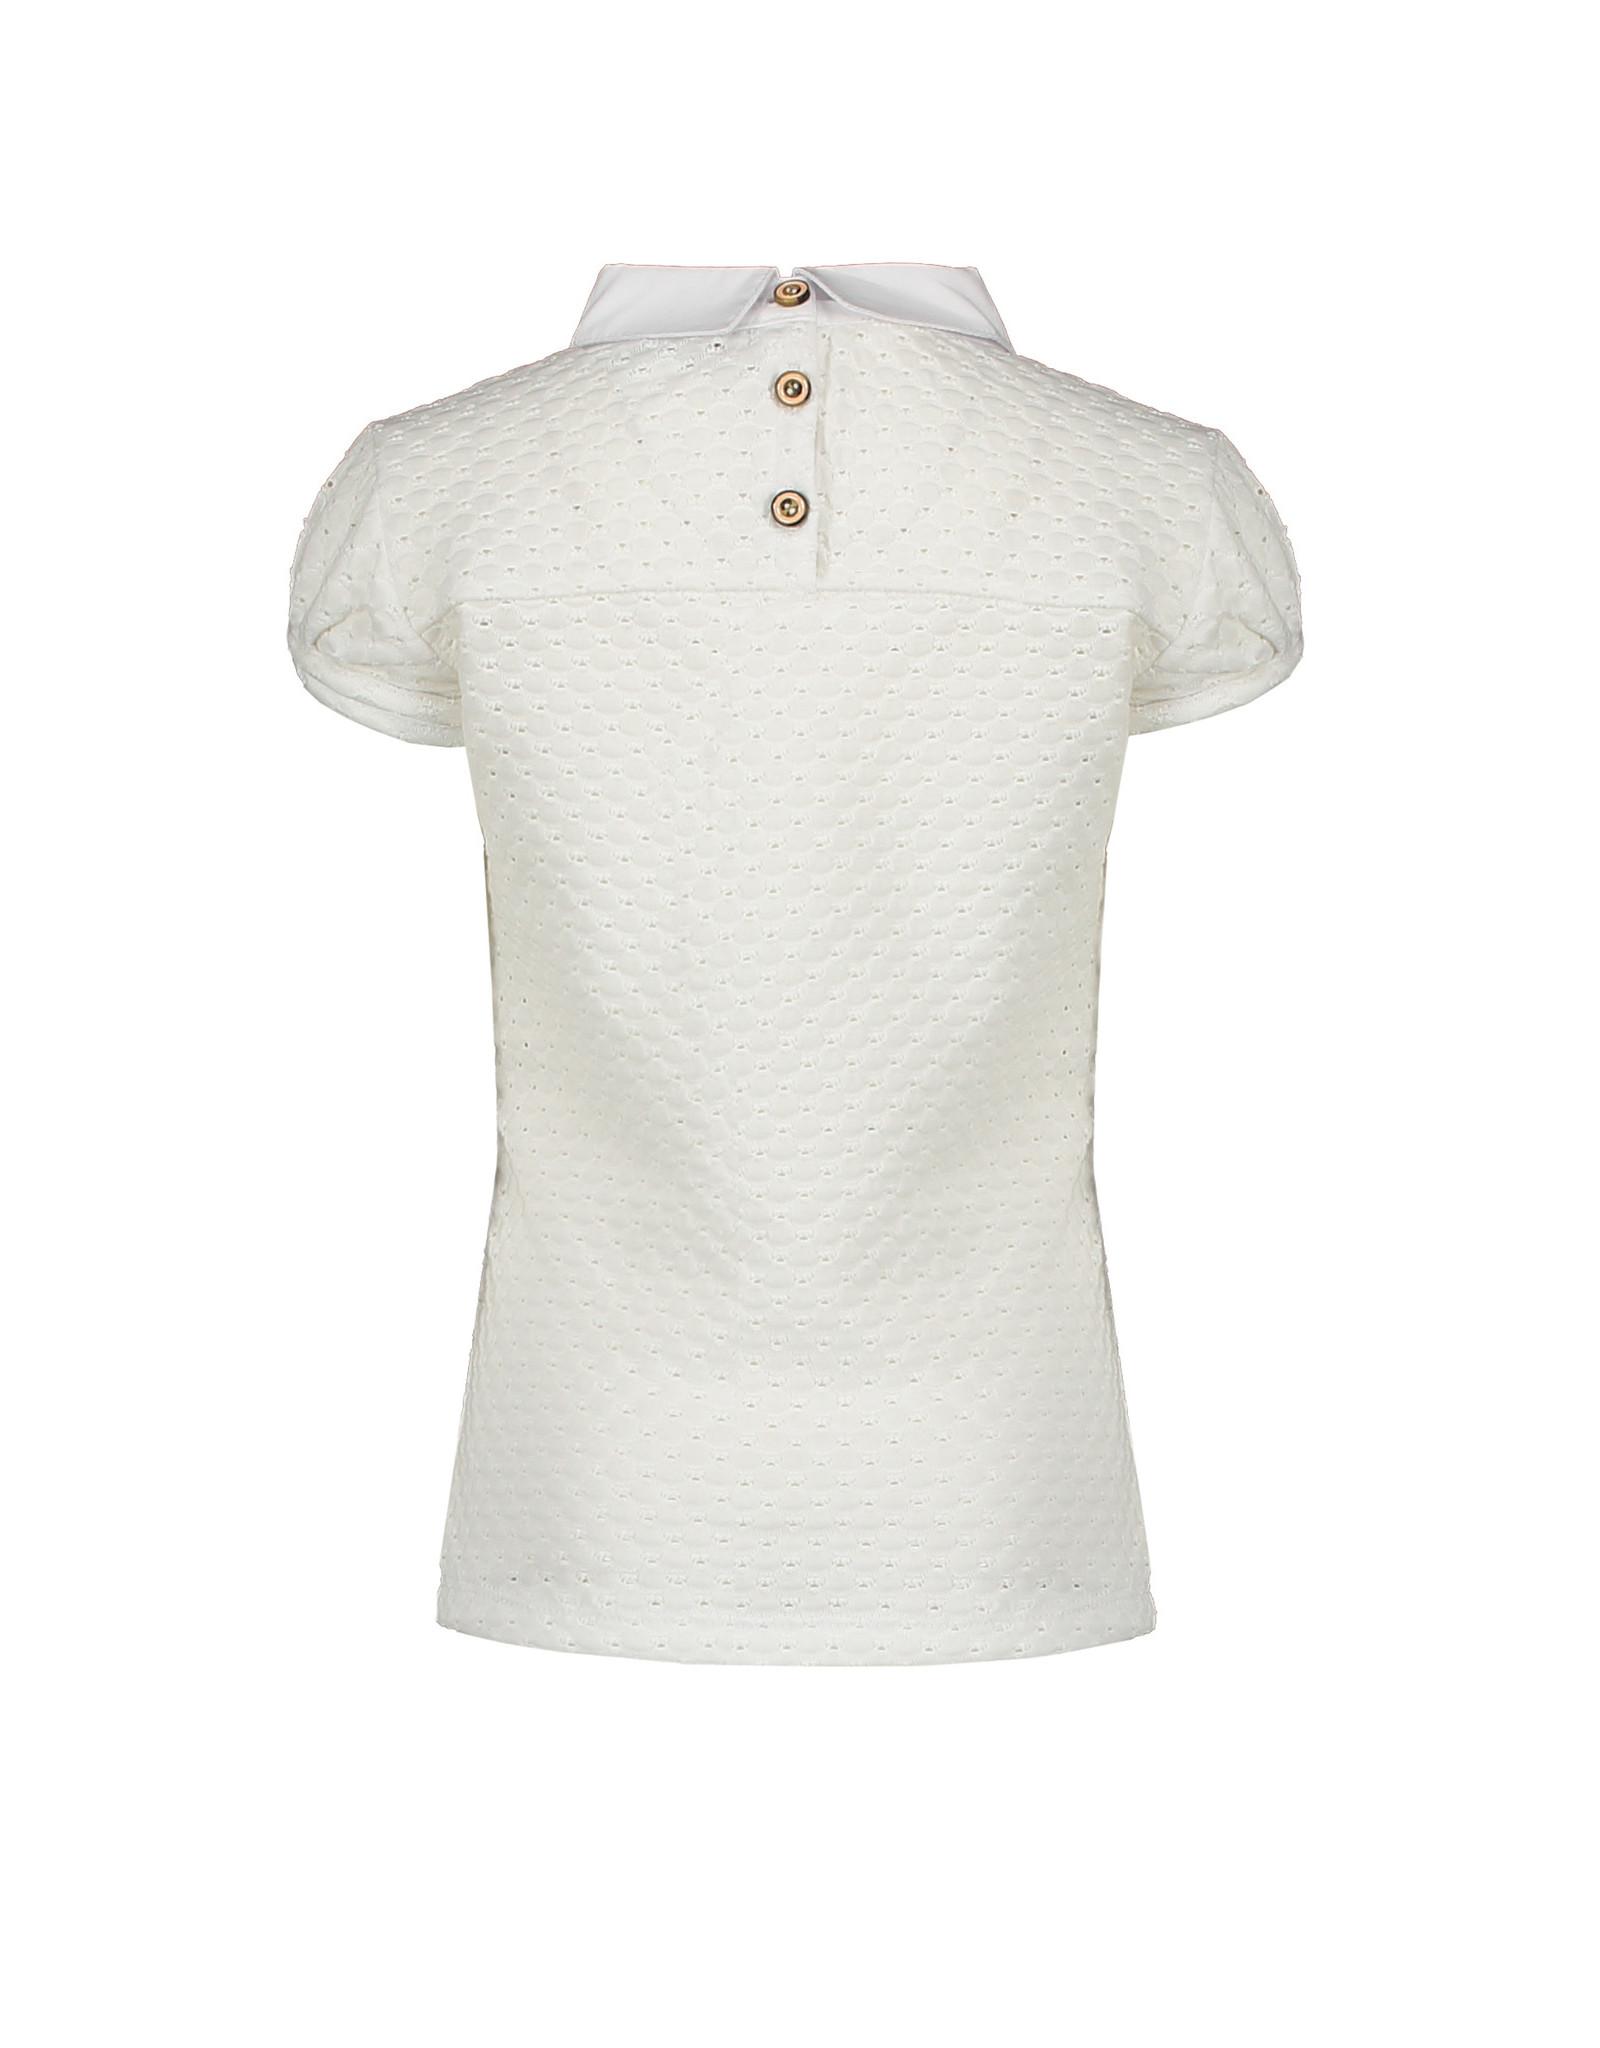 NONO NONO KaliA short sleeve embroidered T0shirt with woven collar Optical White